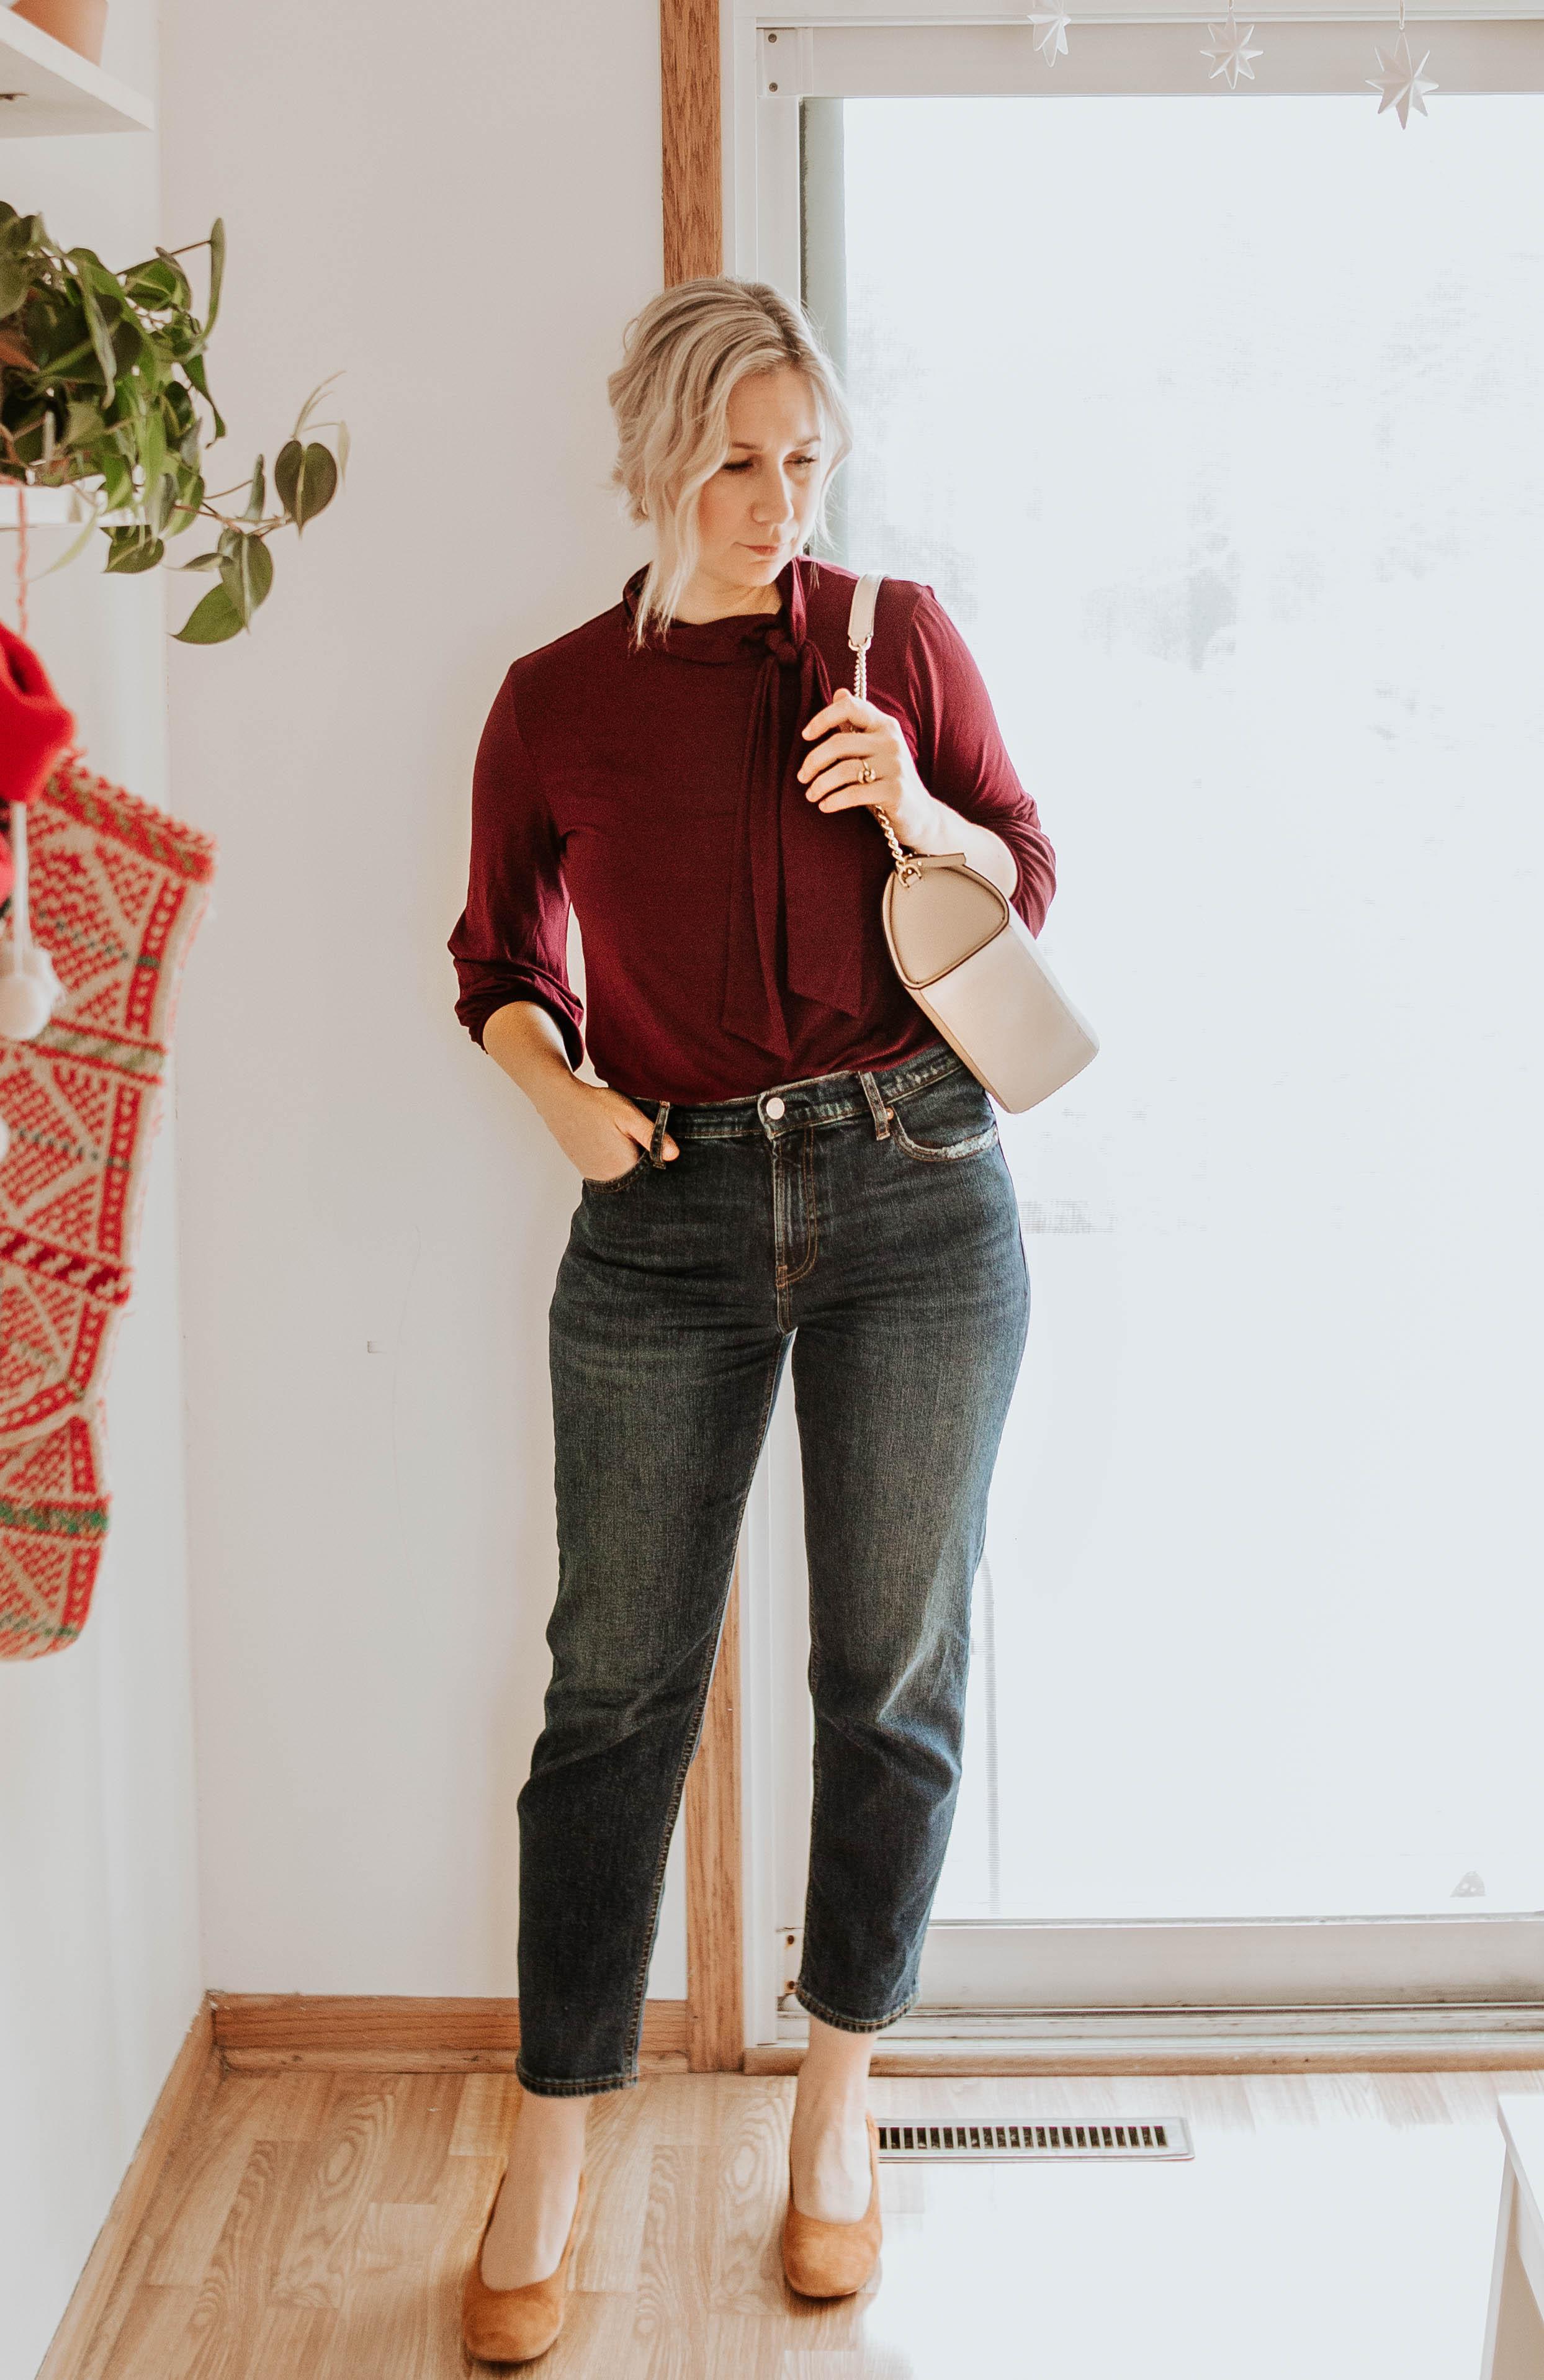 Mini Holiday Lookbook Featuring Ethical Fashion,tie neck blouse , amour vert,,colorful blouse , everlane day heels, Kate Spade Karen Nichols Street Bag Shoulder Rose Cloud Beige Nude